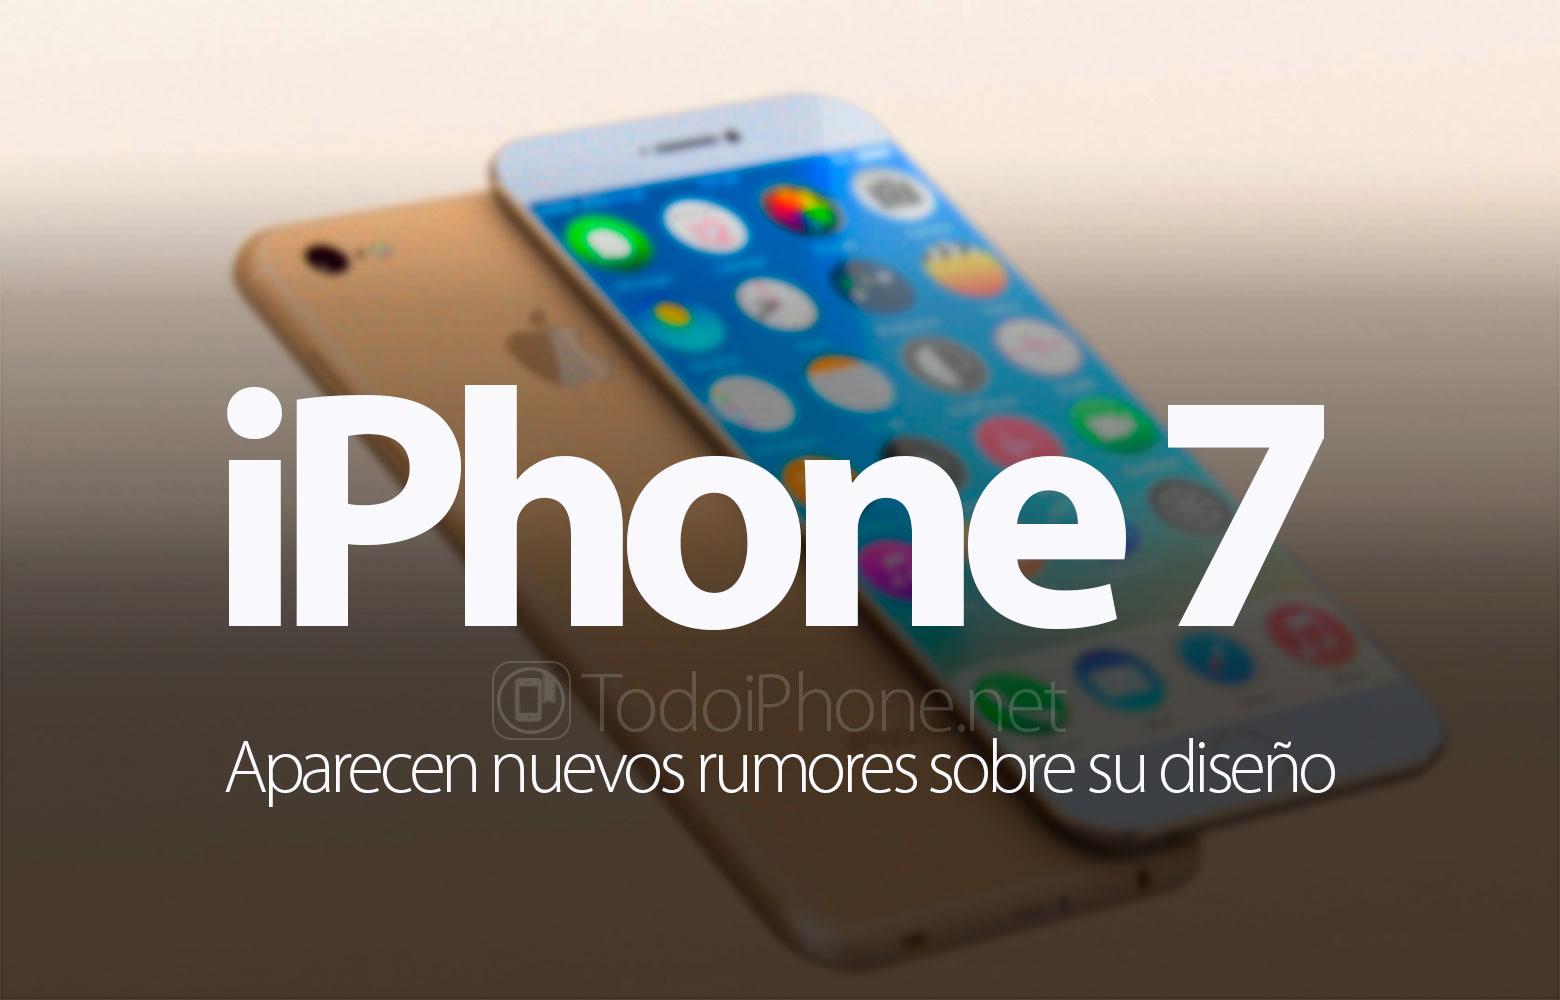 iphone-7-nuevo-diseno-camara-antenas-parte-trasera